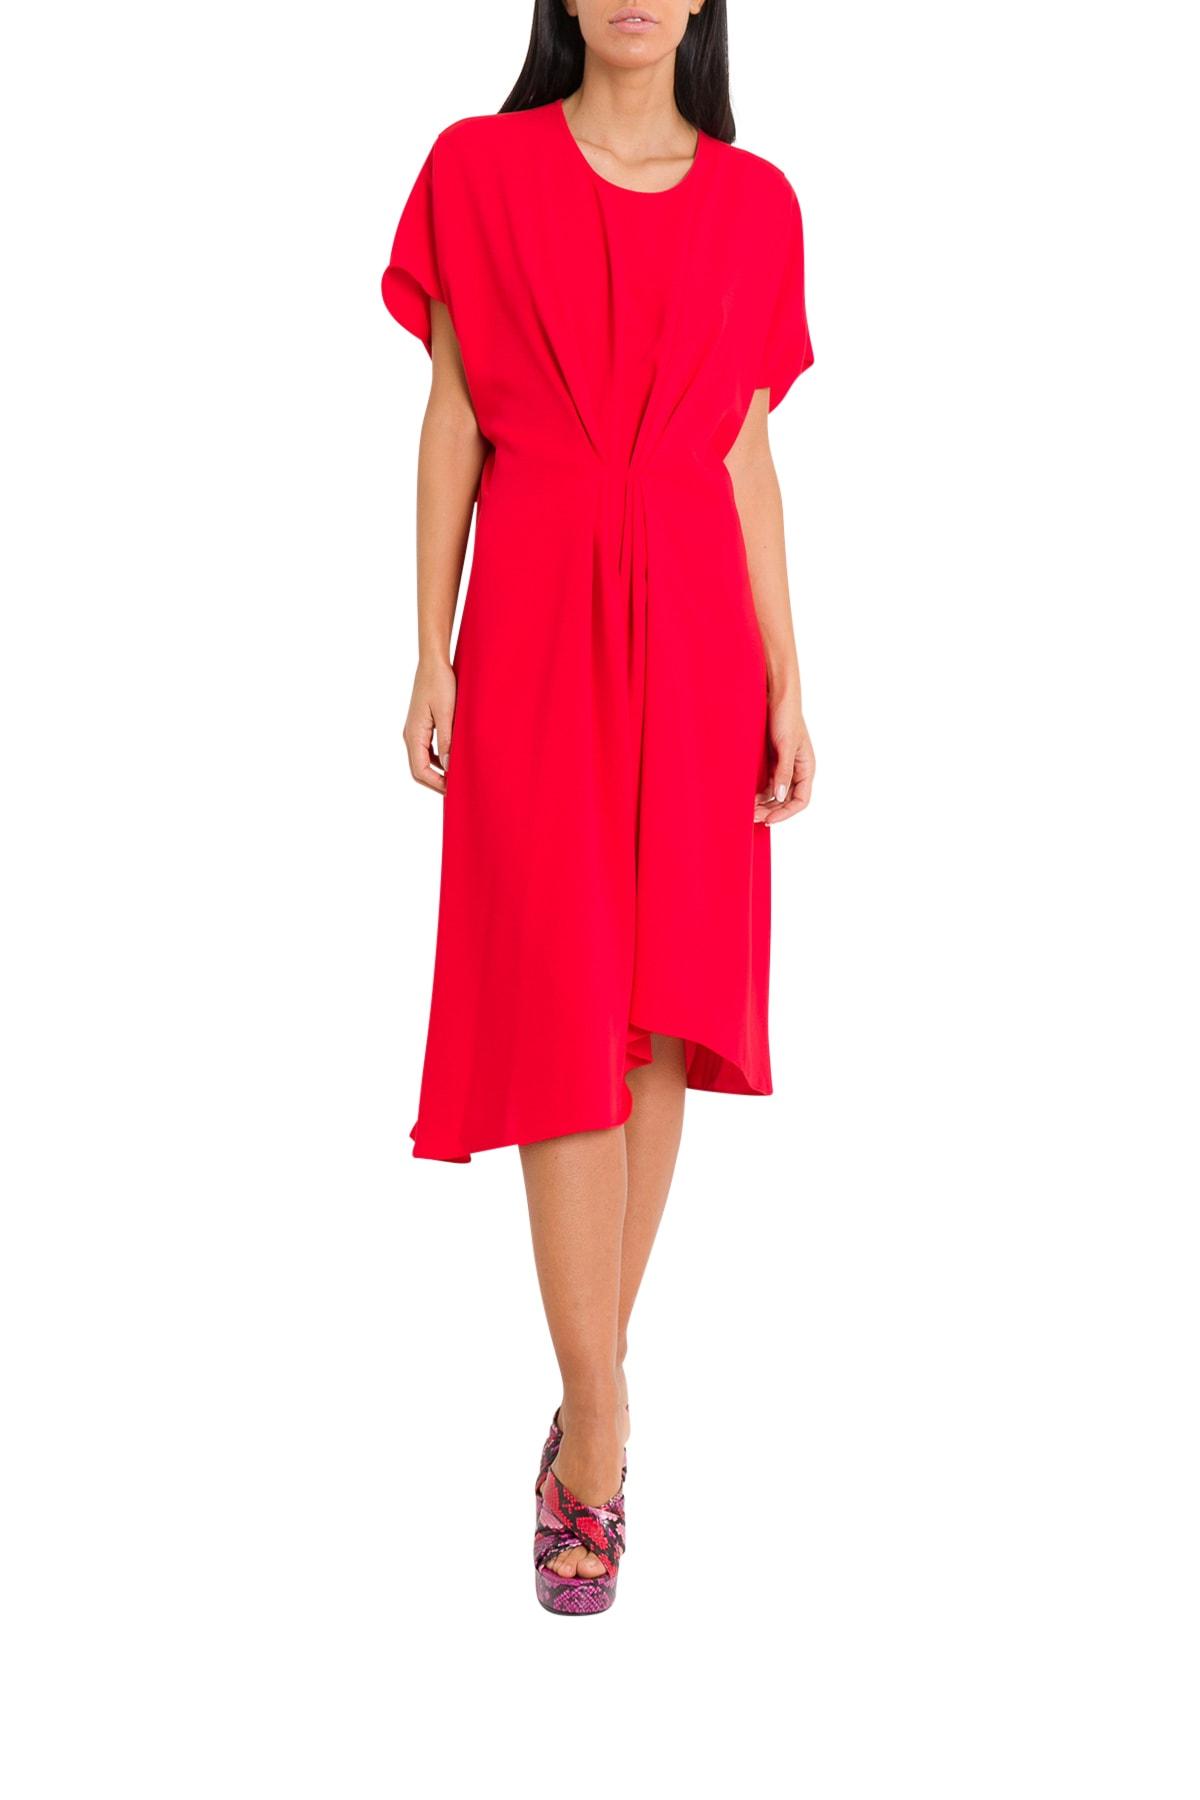 Kenzo Gathered Asymmetric Dress